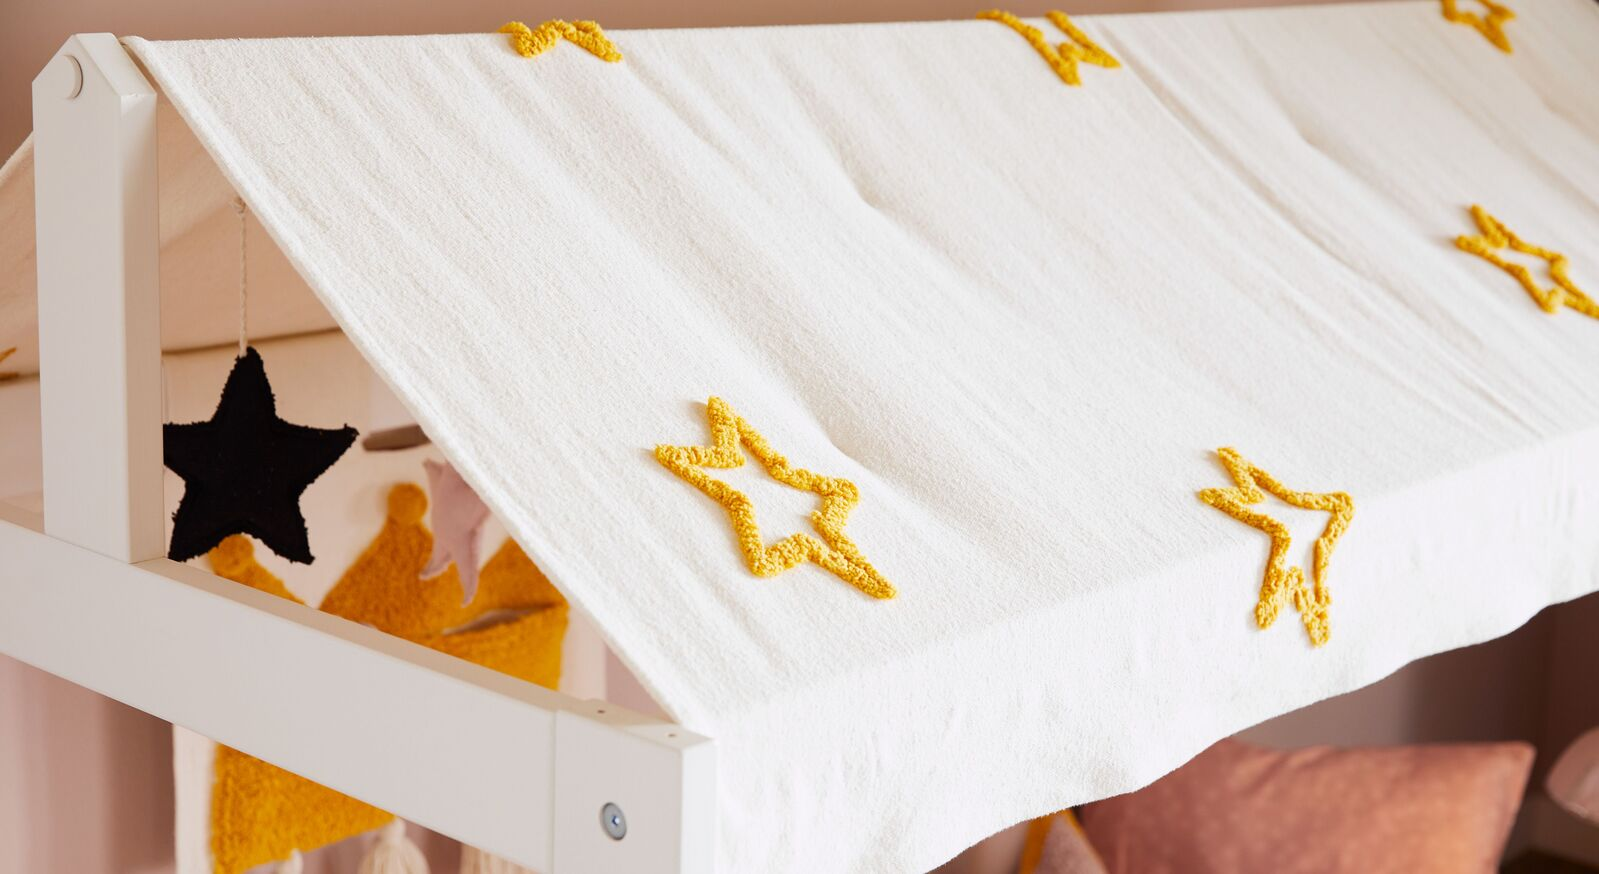 LIFETIME Kinderbett Princess Stars mit gemütlichem Dachhimmel